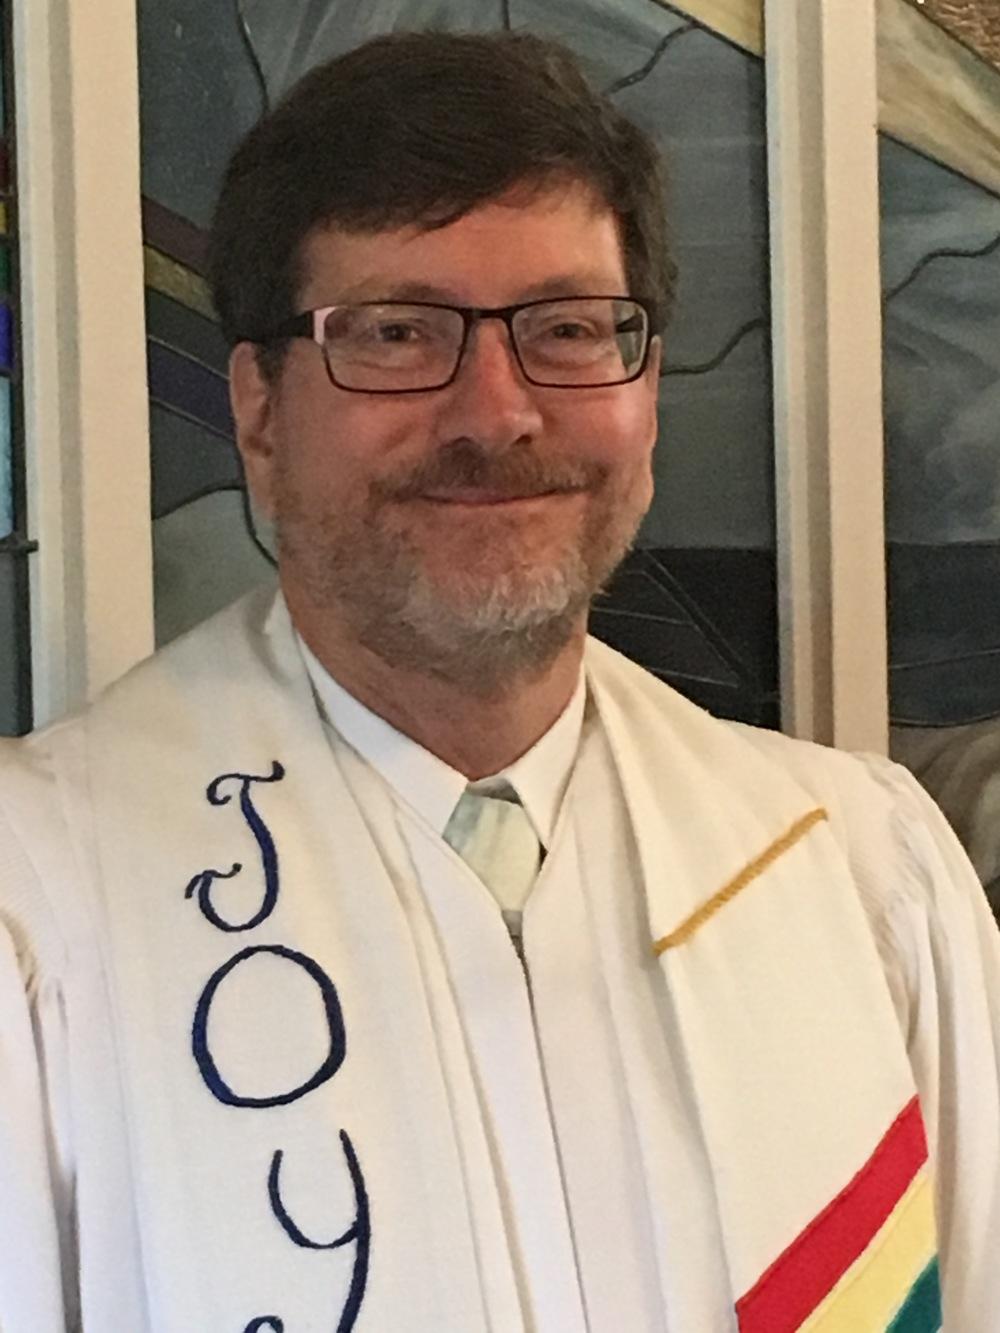 Pastor David Hunter